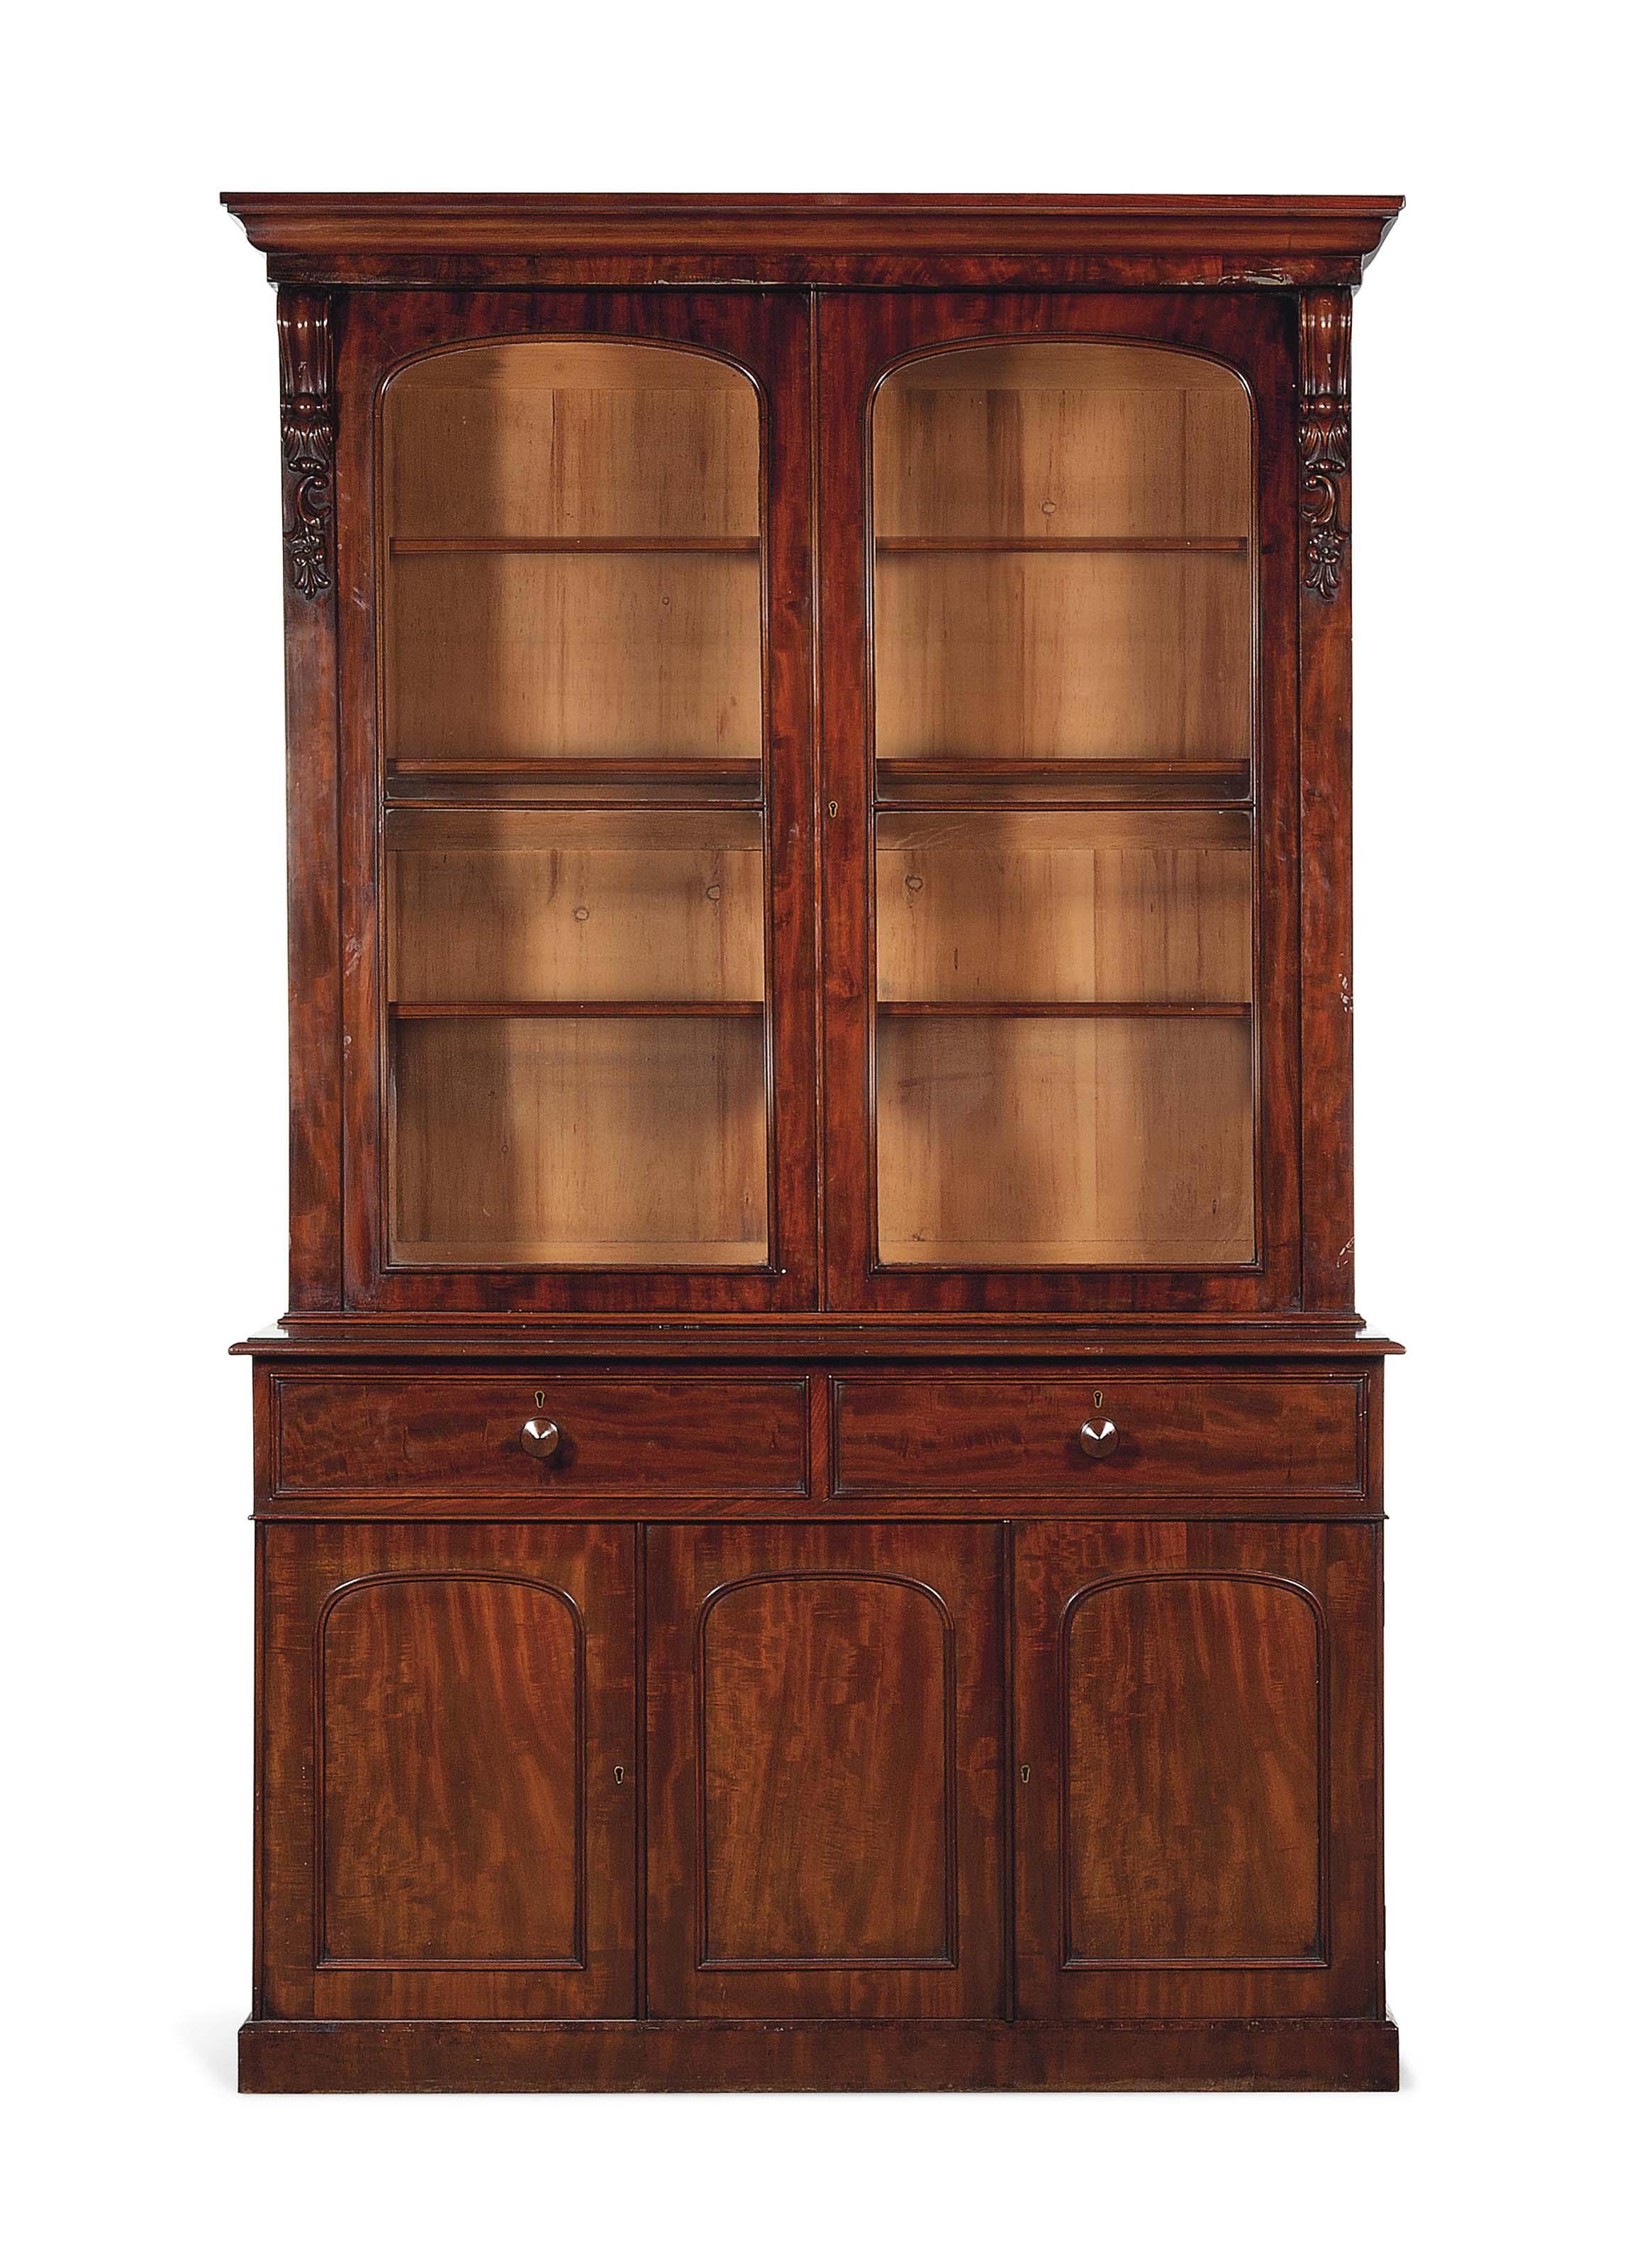 An Early Victorian Mahogany Bookcase Circa 1850 Bookcase